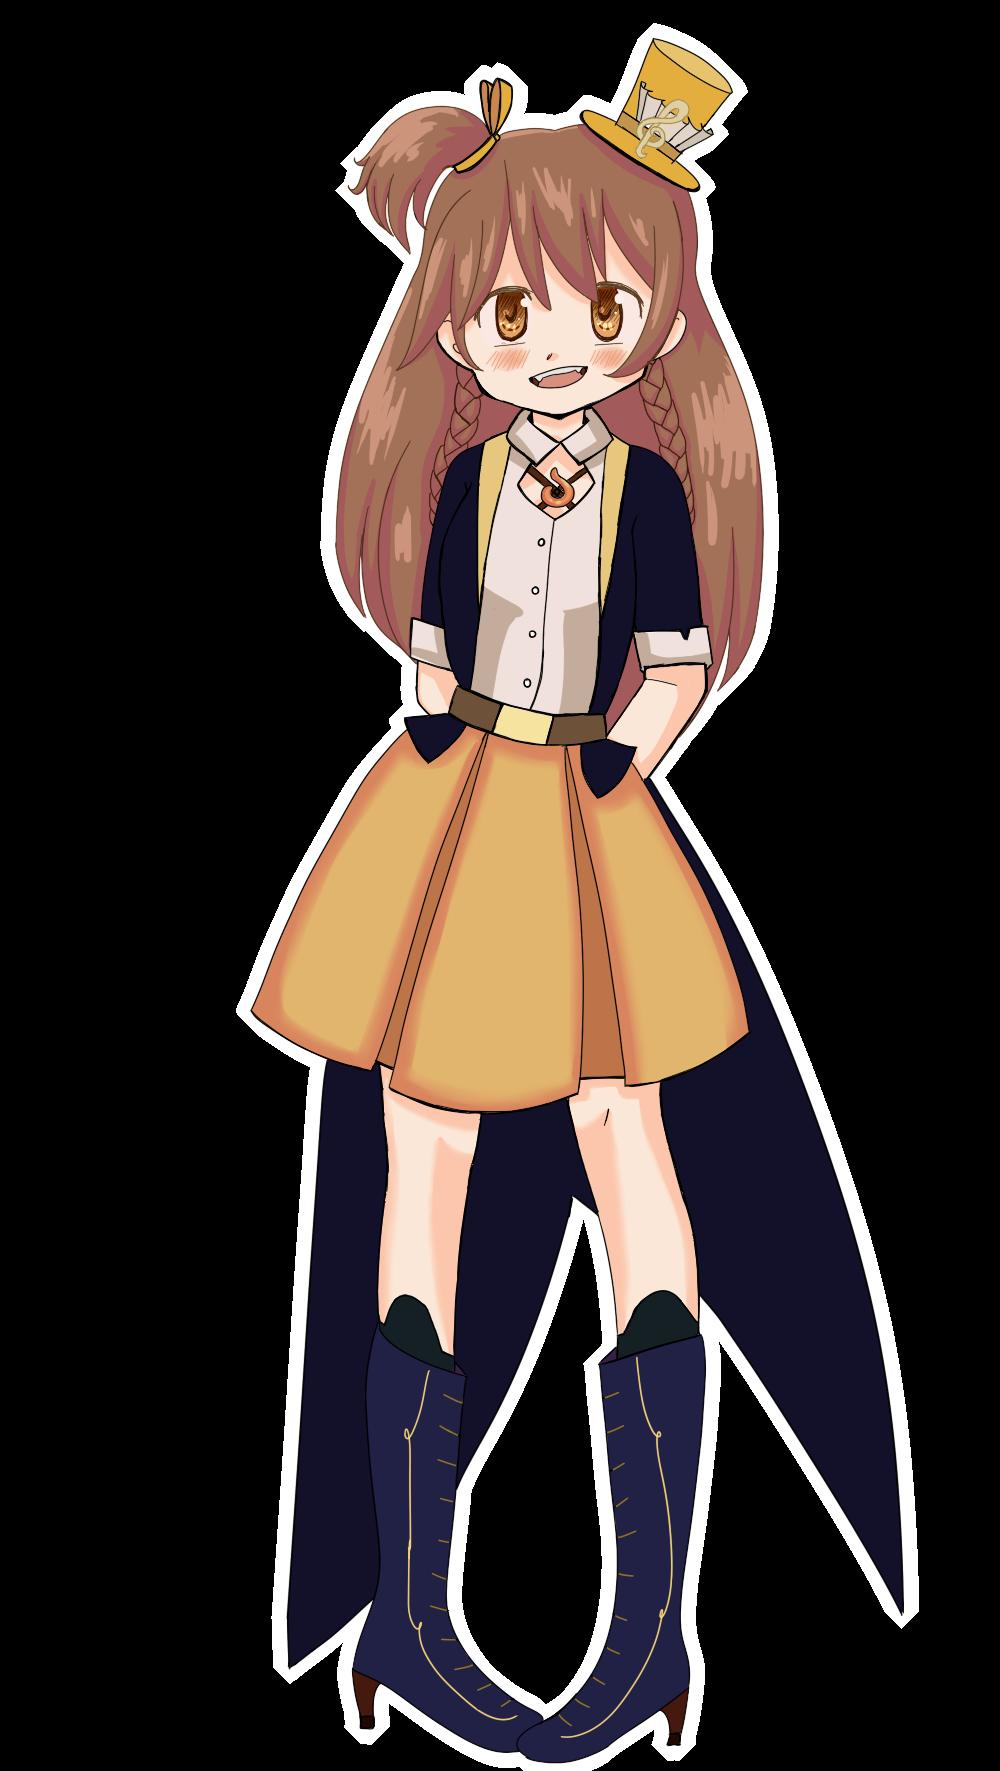 Puella Magi Madoka Magica Original Character By Colettehatesyou On Deviantart